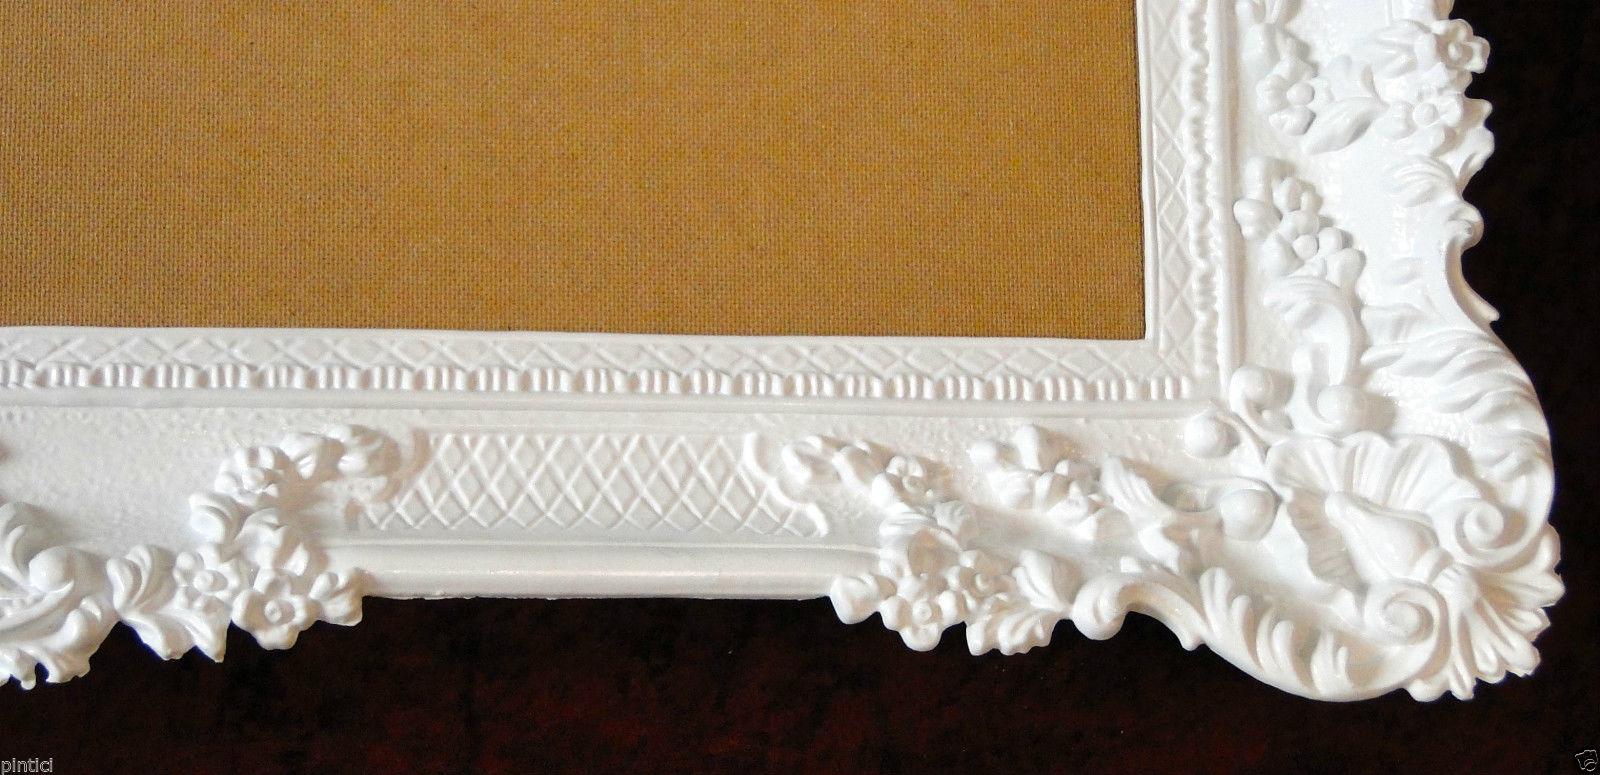 bilderrahmen hochzeit 96x57 spiegelrahmen gem lde wei barock antik rahmen foto kaufen bei. Black Bedroom Furniture Sets. Home Design Ideas